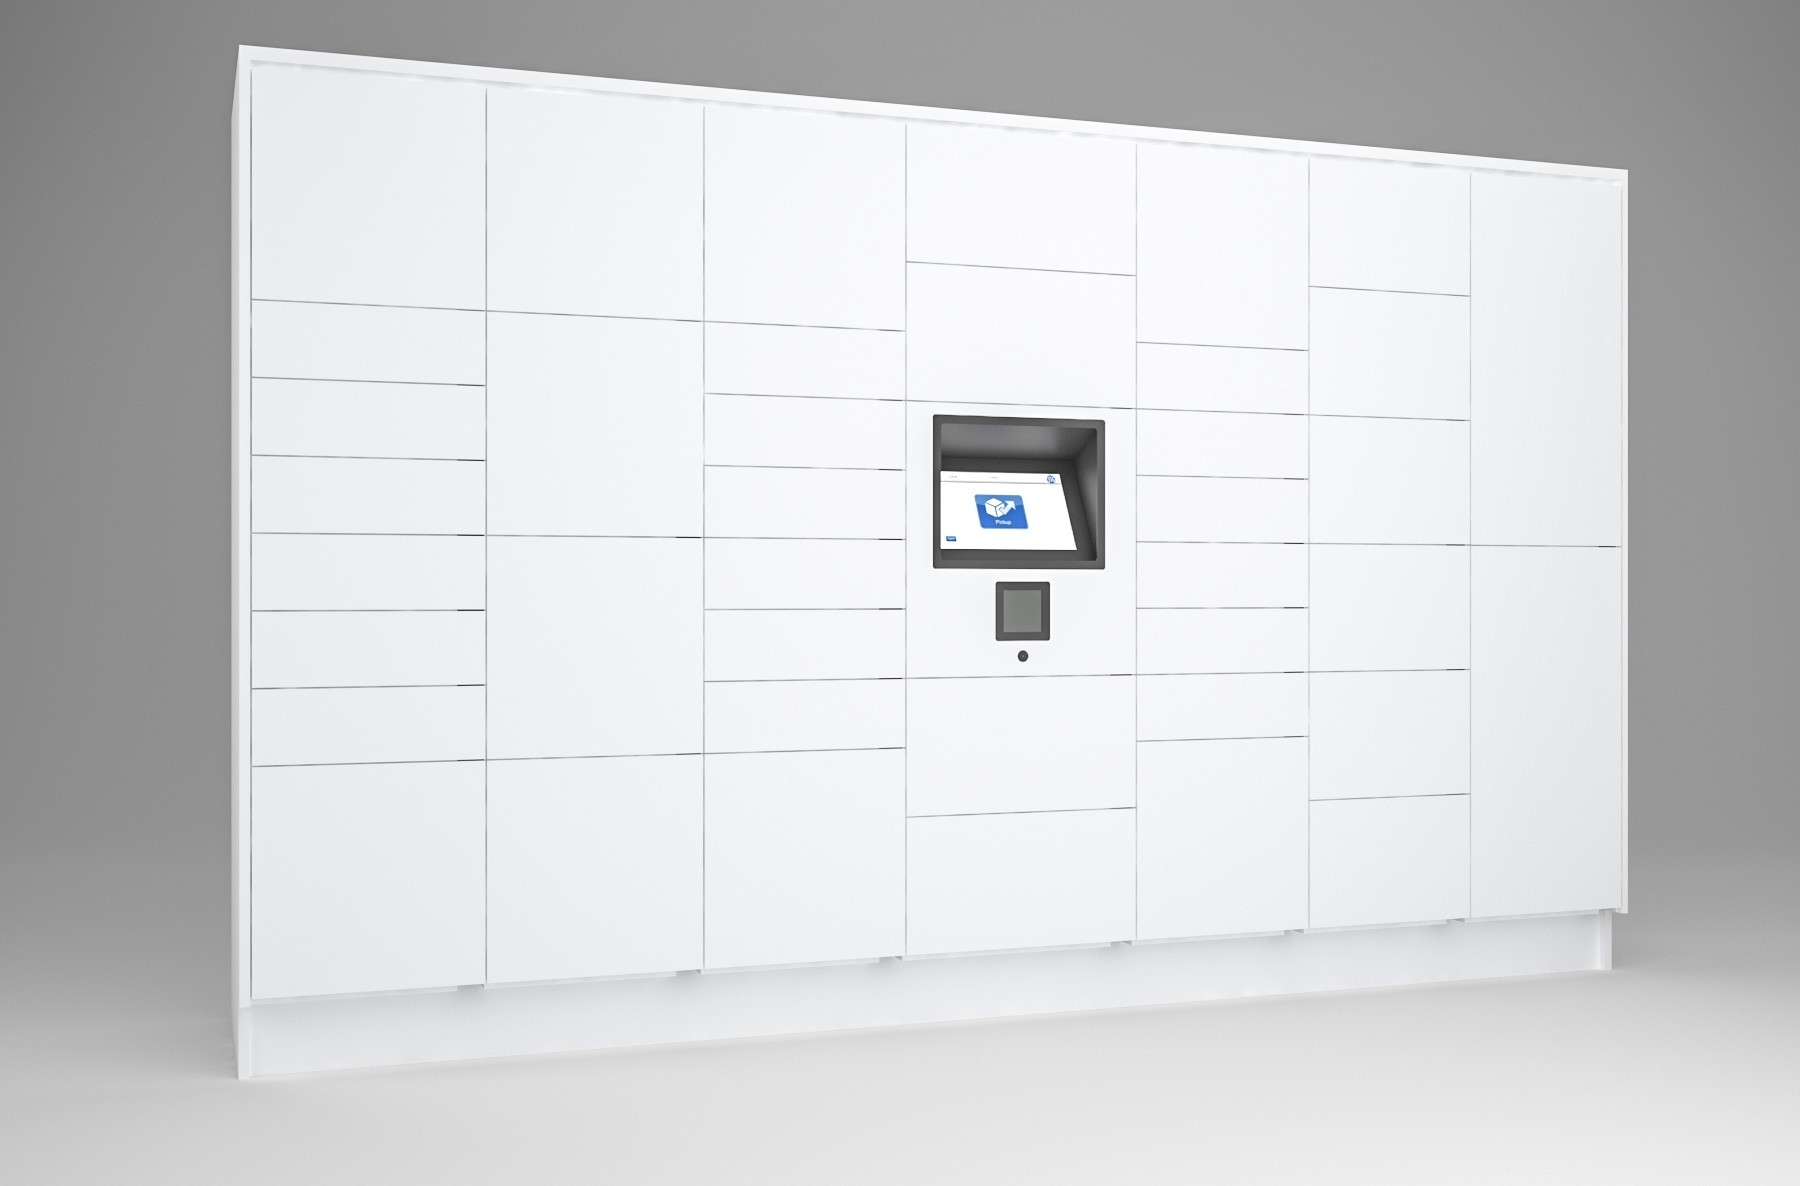 40 Total Openings Laminate Smart Locker